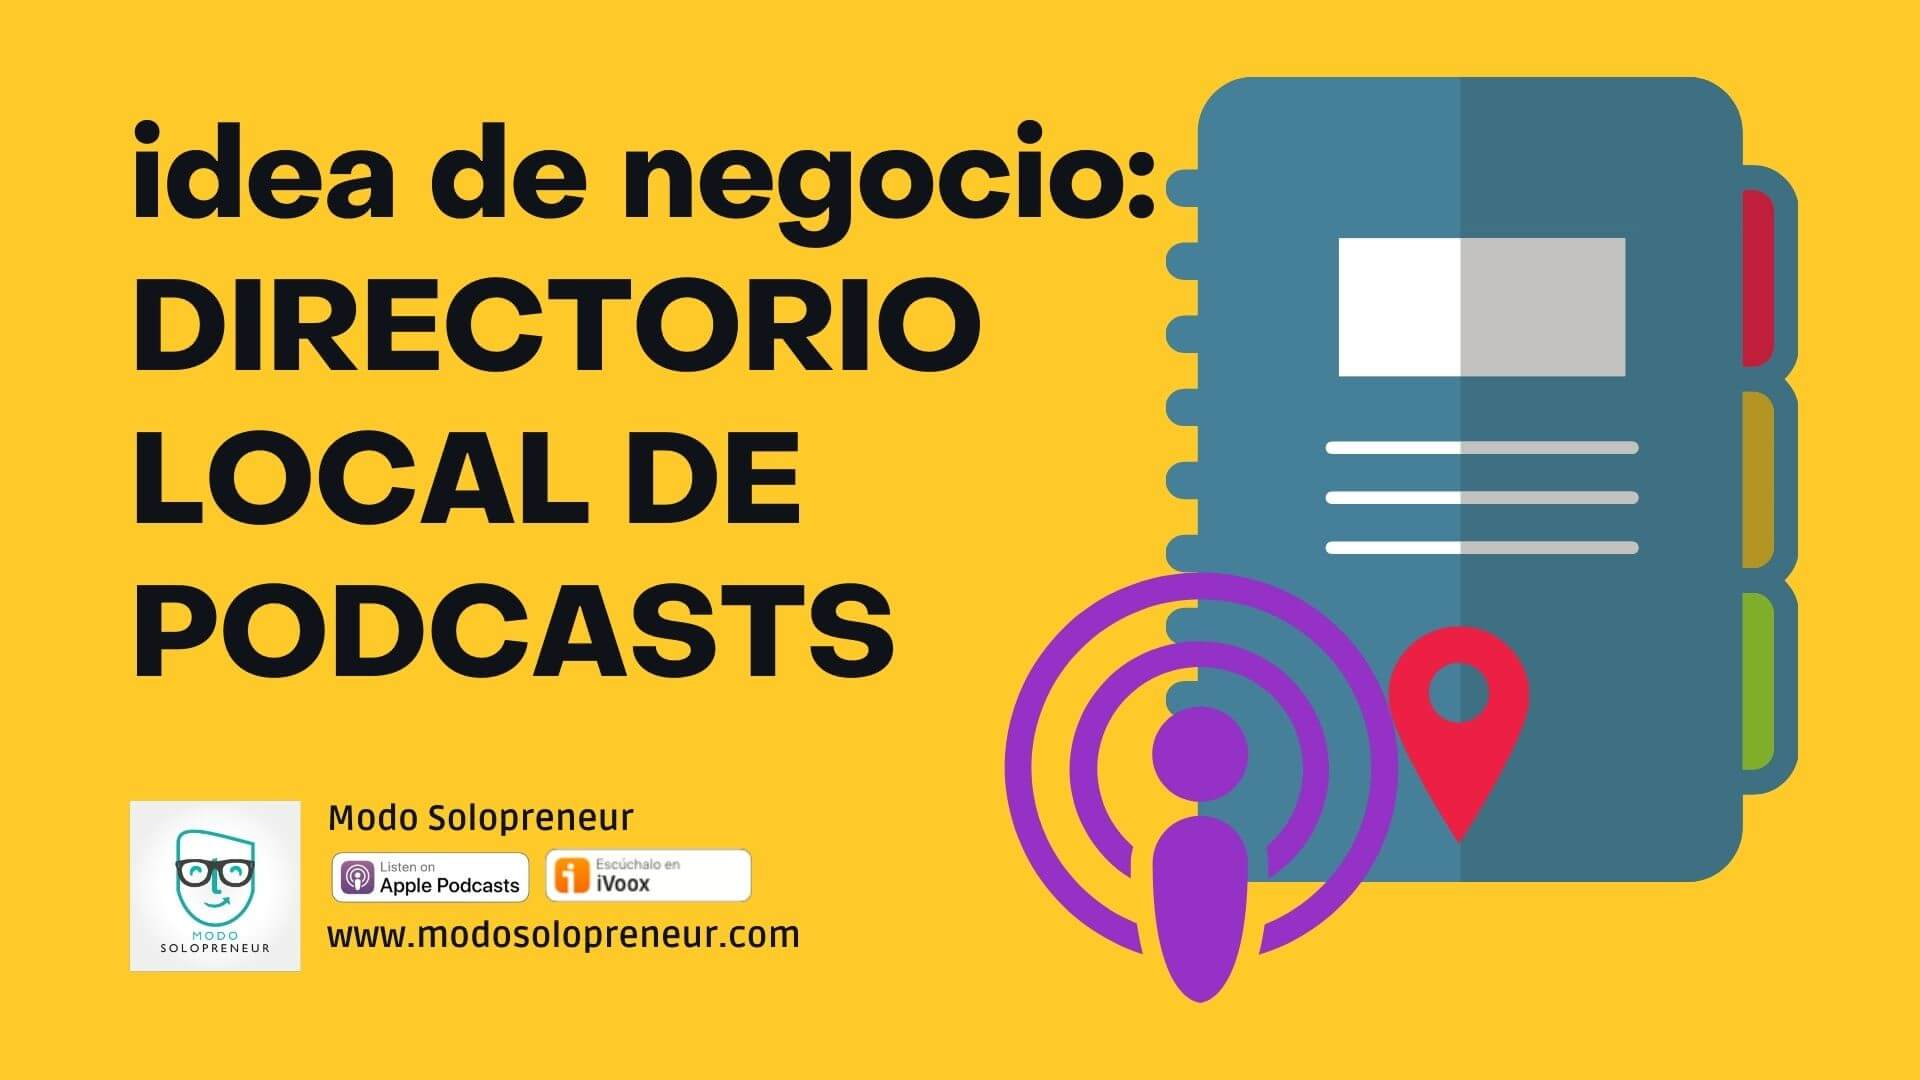 Directorio local de podcasts